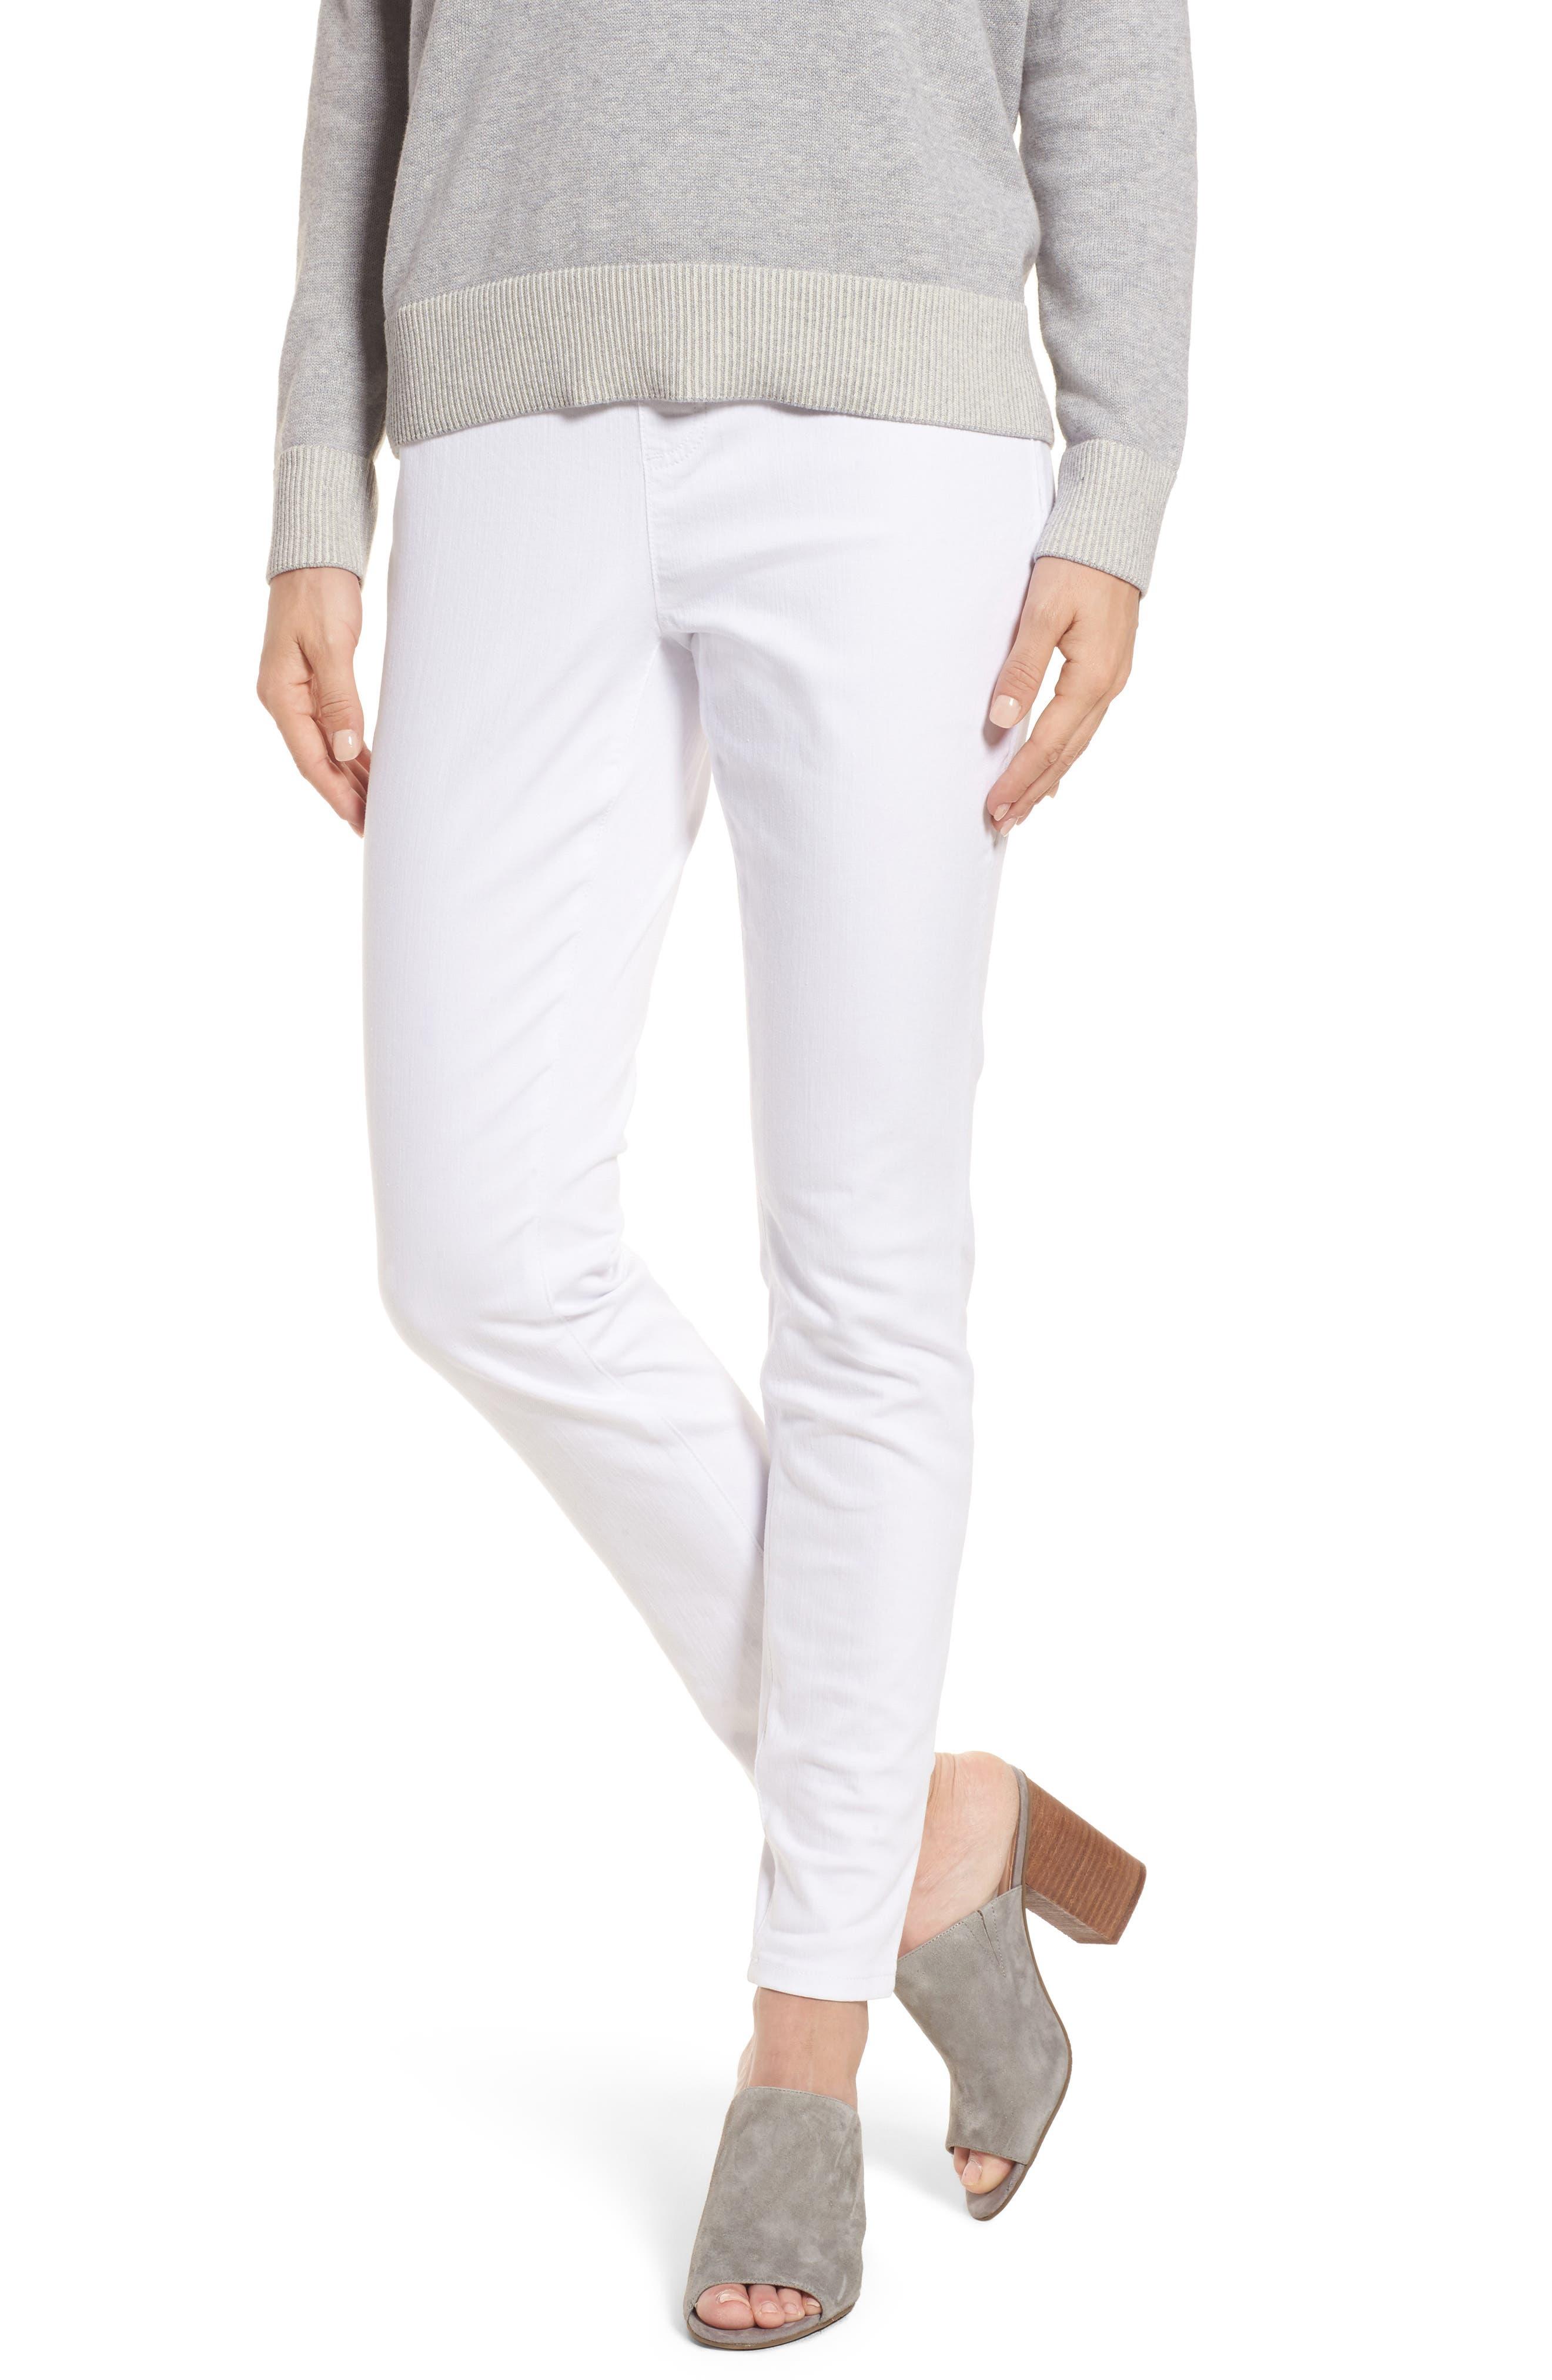 Eileen Fisher Stretch Organic Cotton Denim Skinny Pants (Regular & Petite)